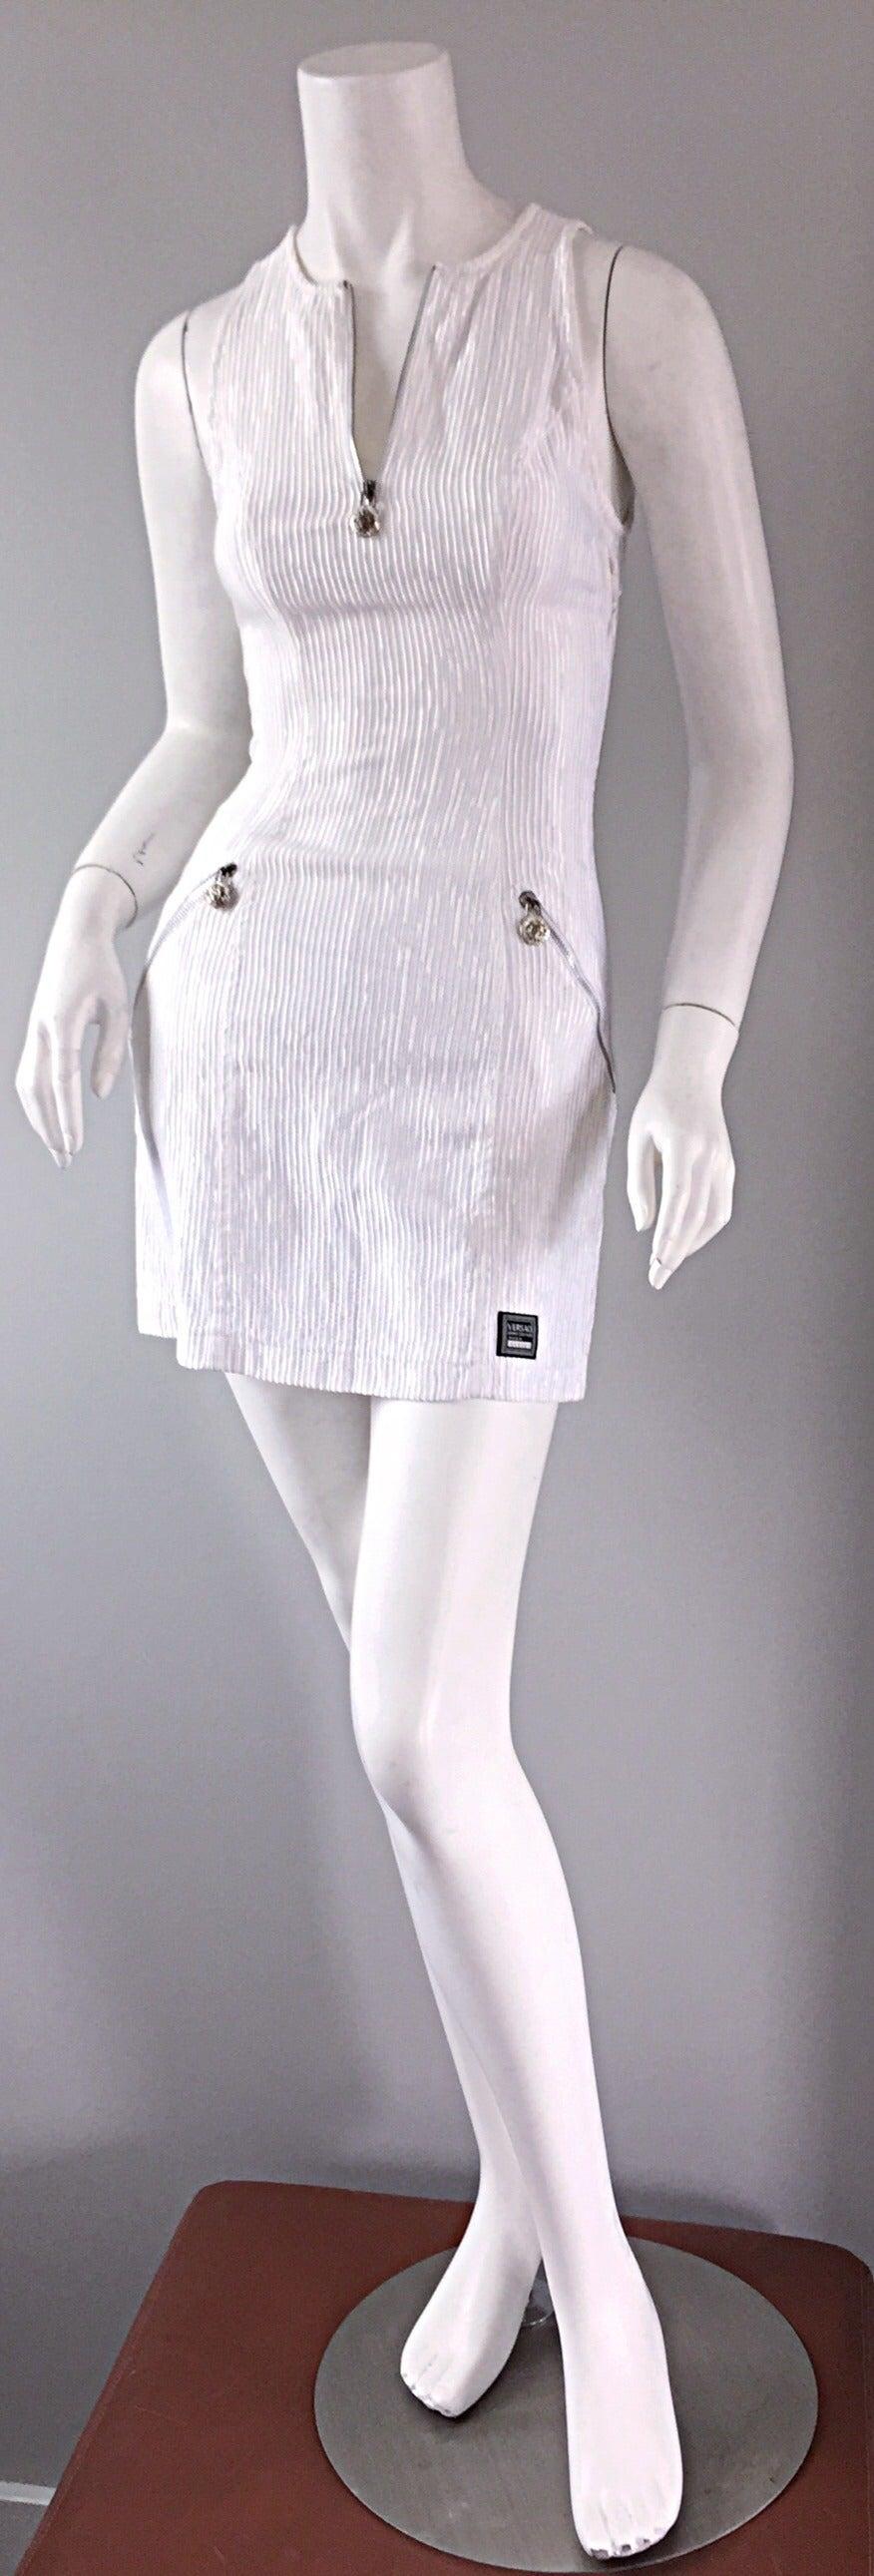 Vintage Gianni Versace White Ribbed BodyCon Scuba Dress Medusa + Rhinestones 9